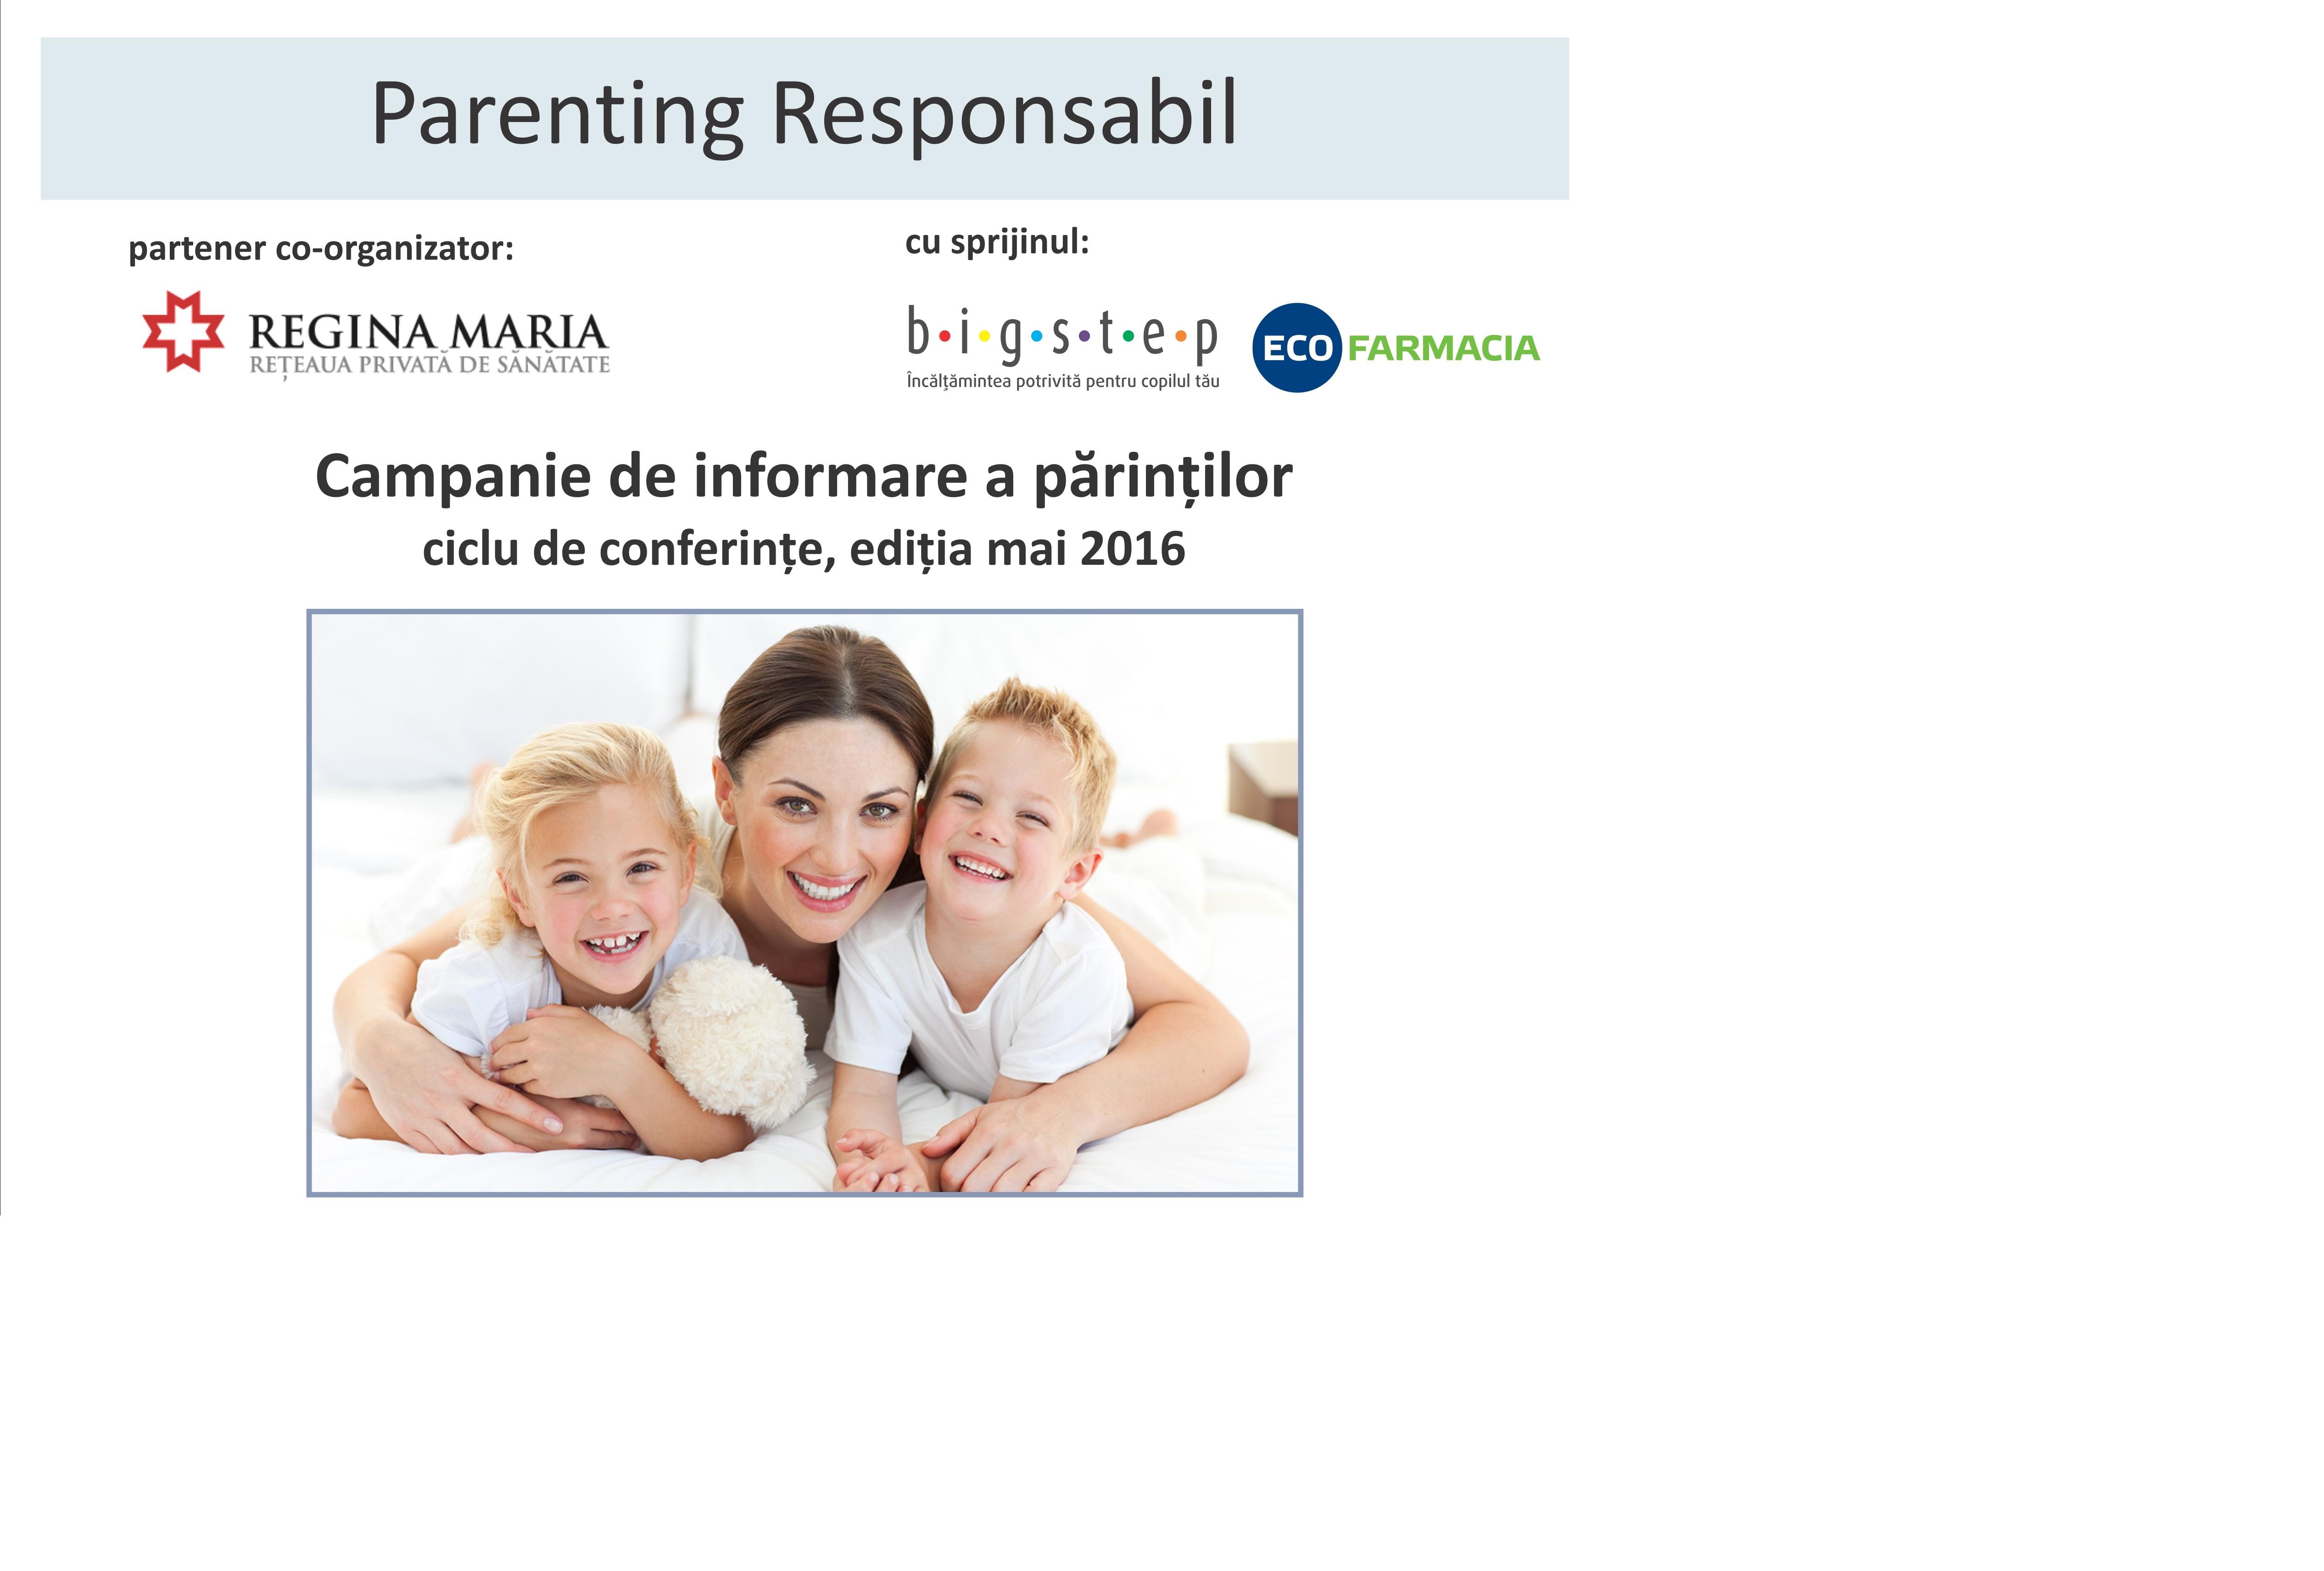 Ciclu de conferințe Parenting responsabil by Round Hill Club – ediția III